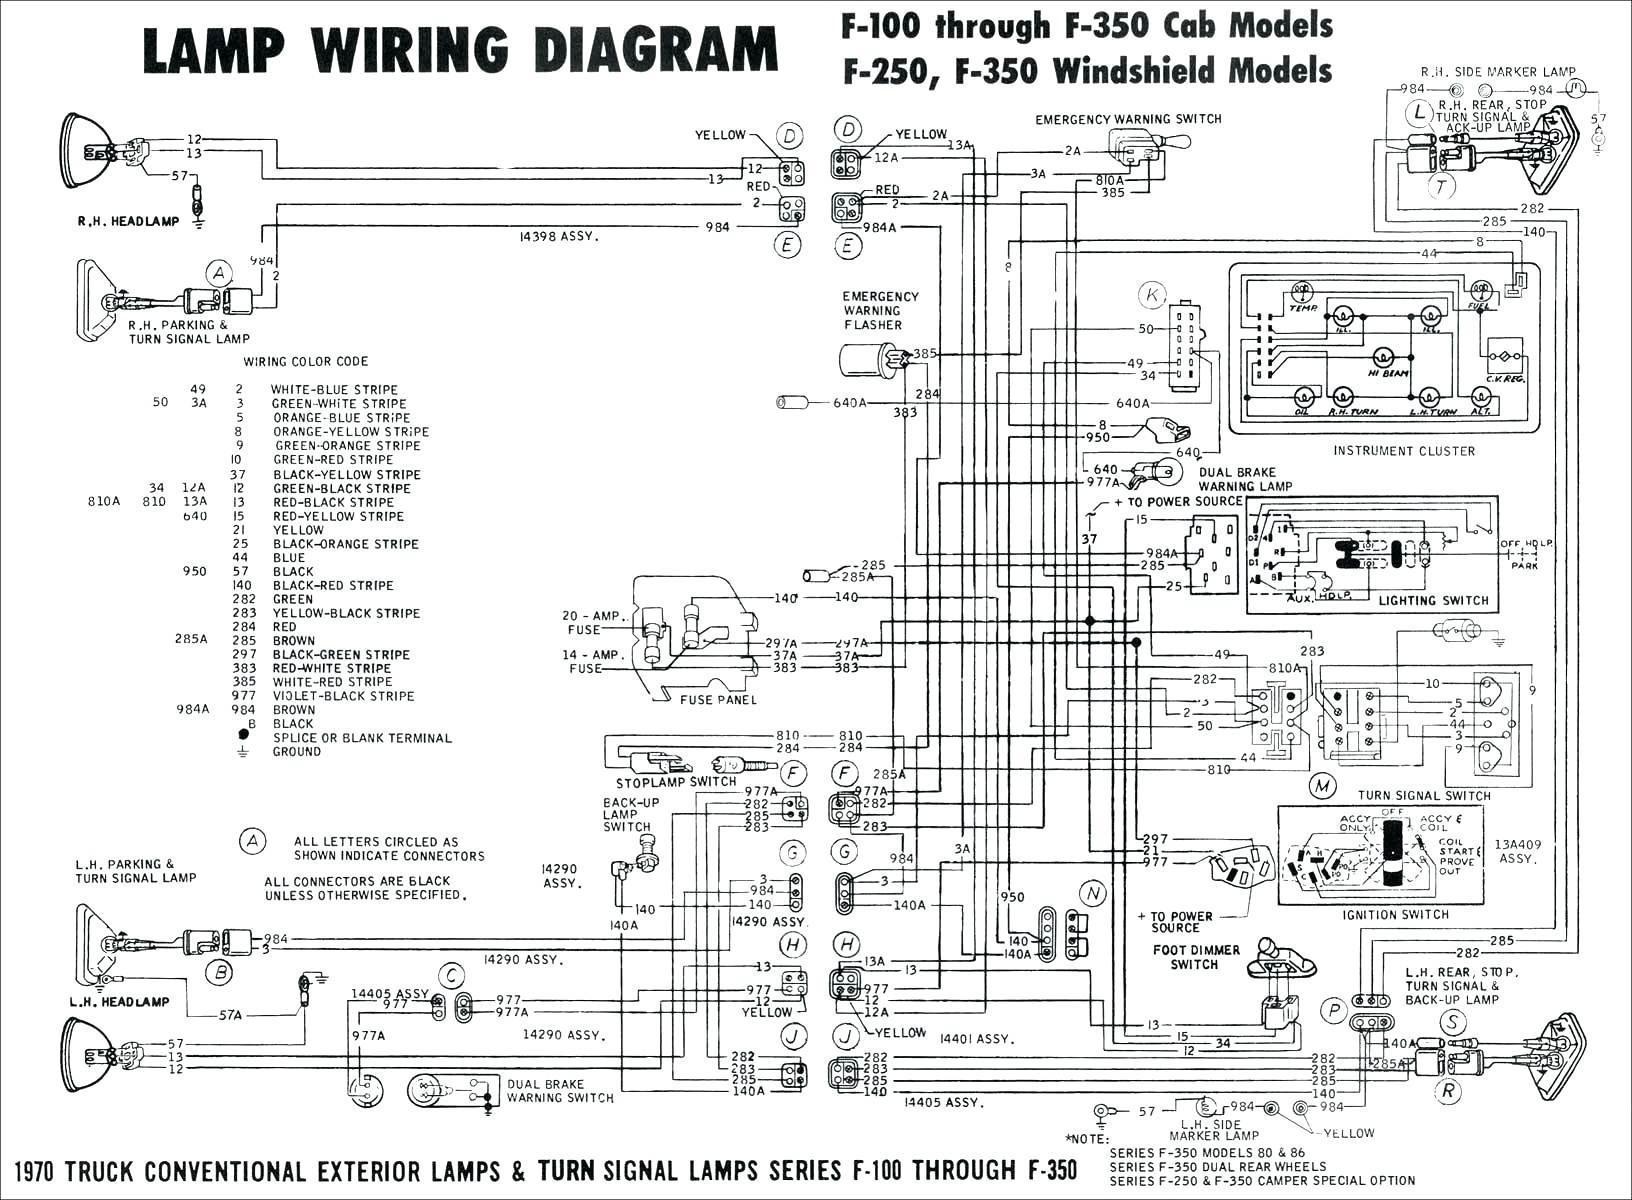 2004 Mazda 6 Engine Diagram 1994 Mazda Alternator Wiring Diagram Simple Wiring Diagram • Of 2004 Mazda 6 Engine Diagram